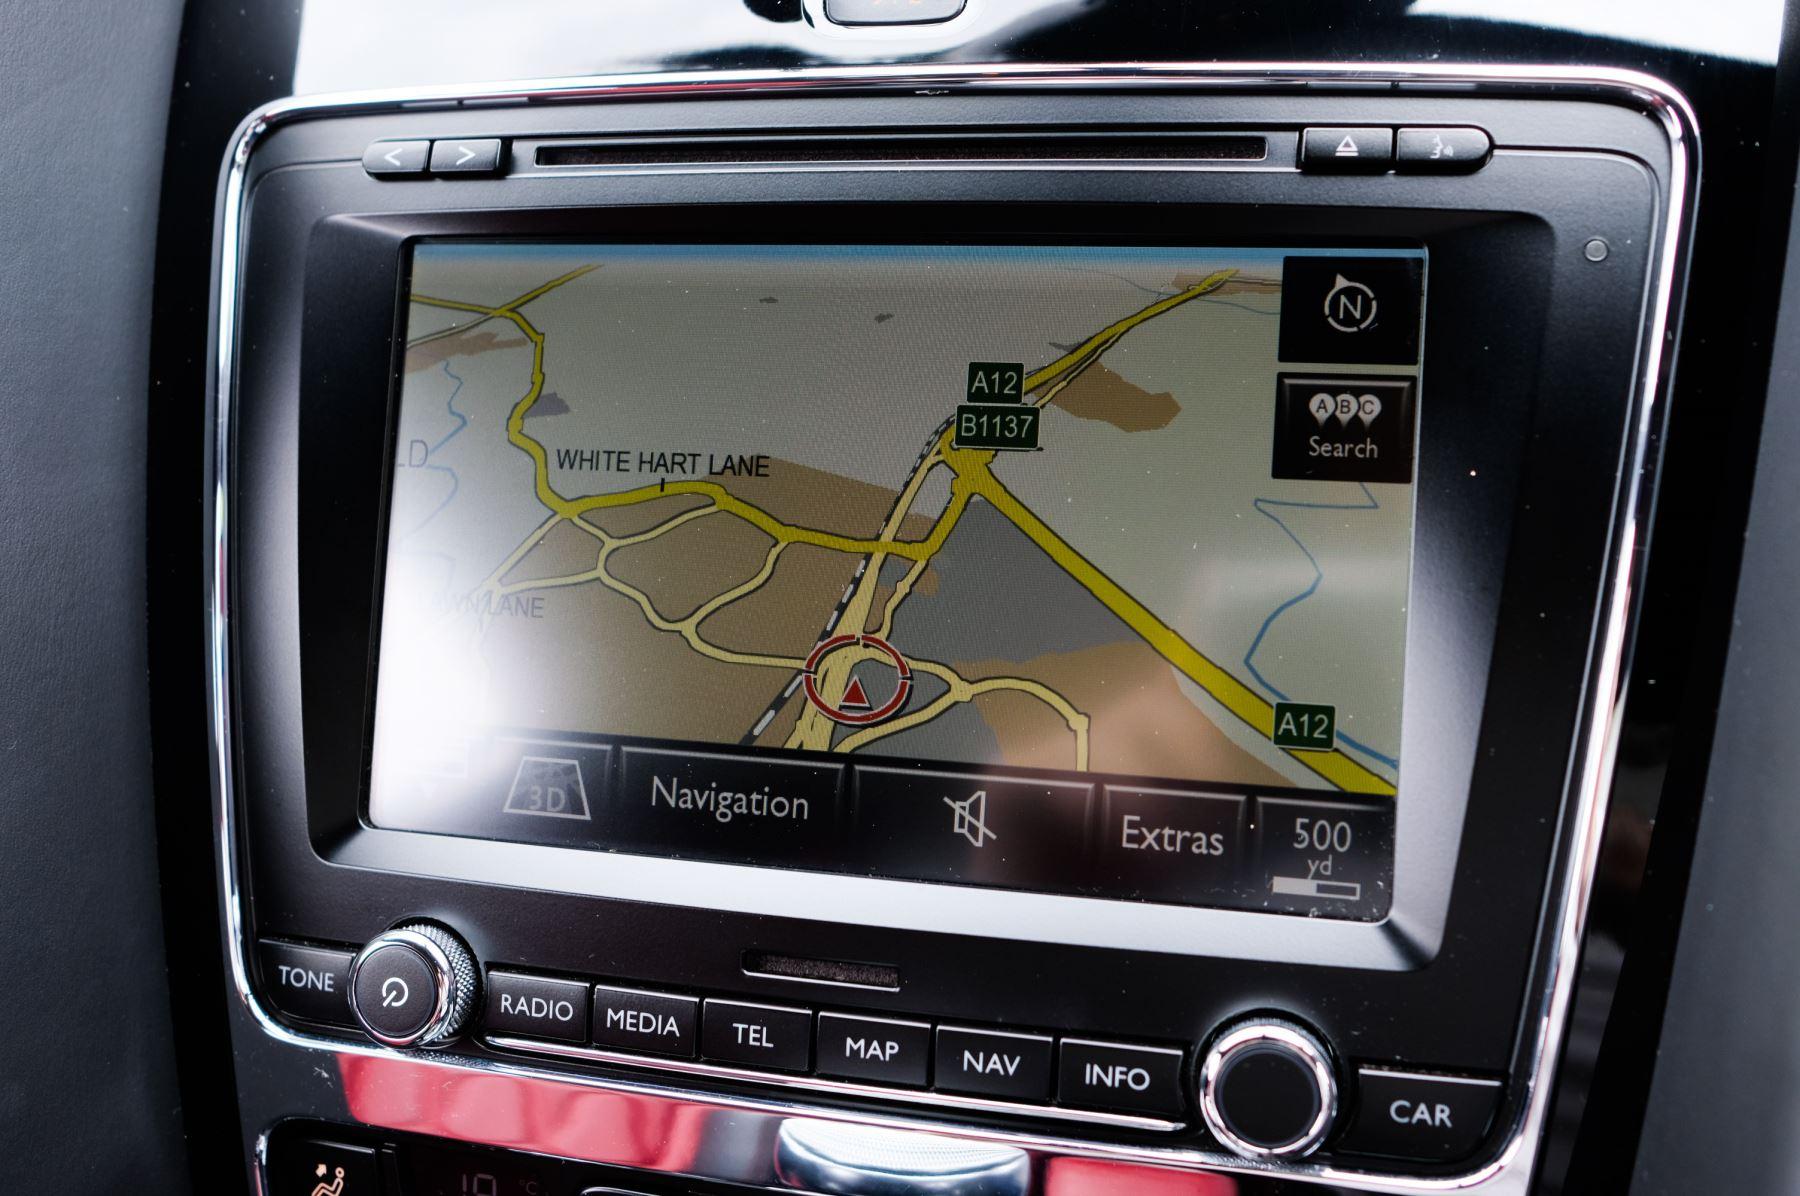 Bentley Continental GTC 6.0 W12 Speed - Massage Seats & Ventilation - Neck Warmer - Rear View Camera image 21